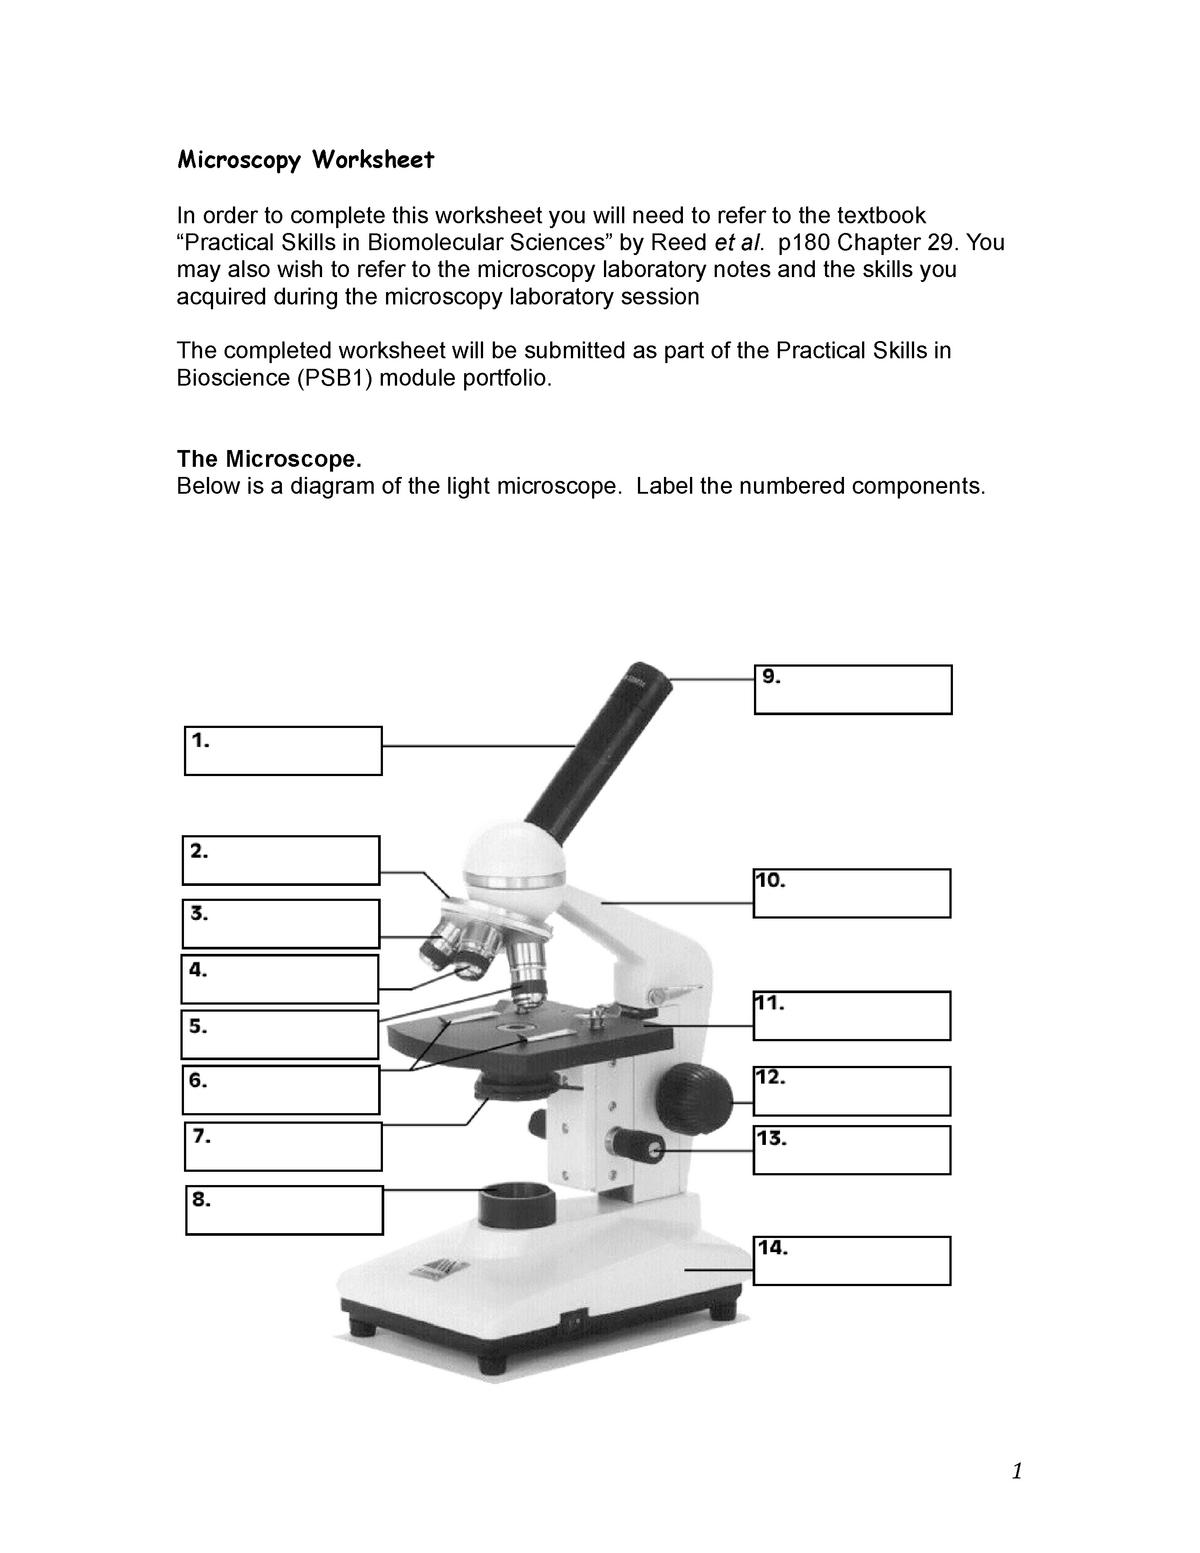 Psb Microscopy Worksheet Practical Skills In Biosciences 1 Studocu